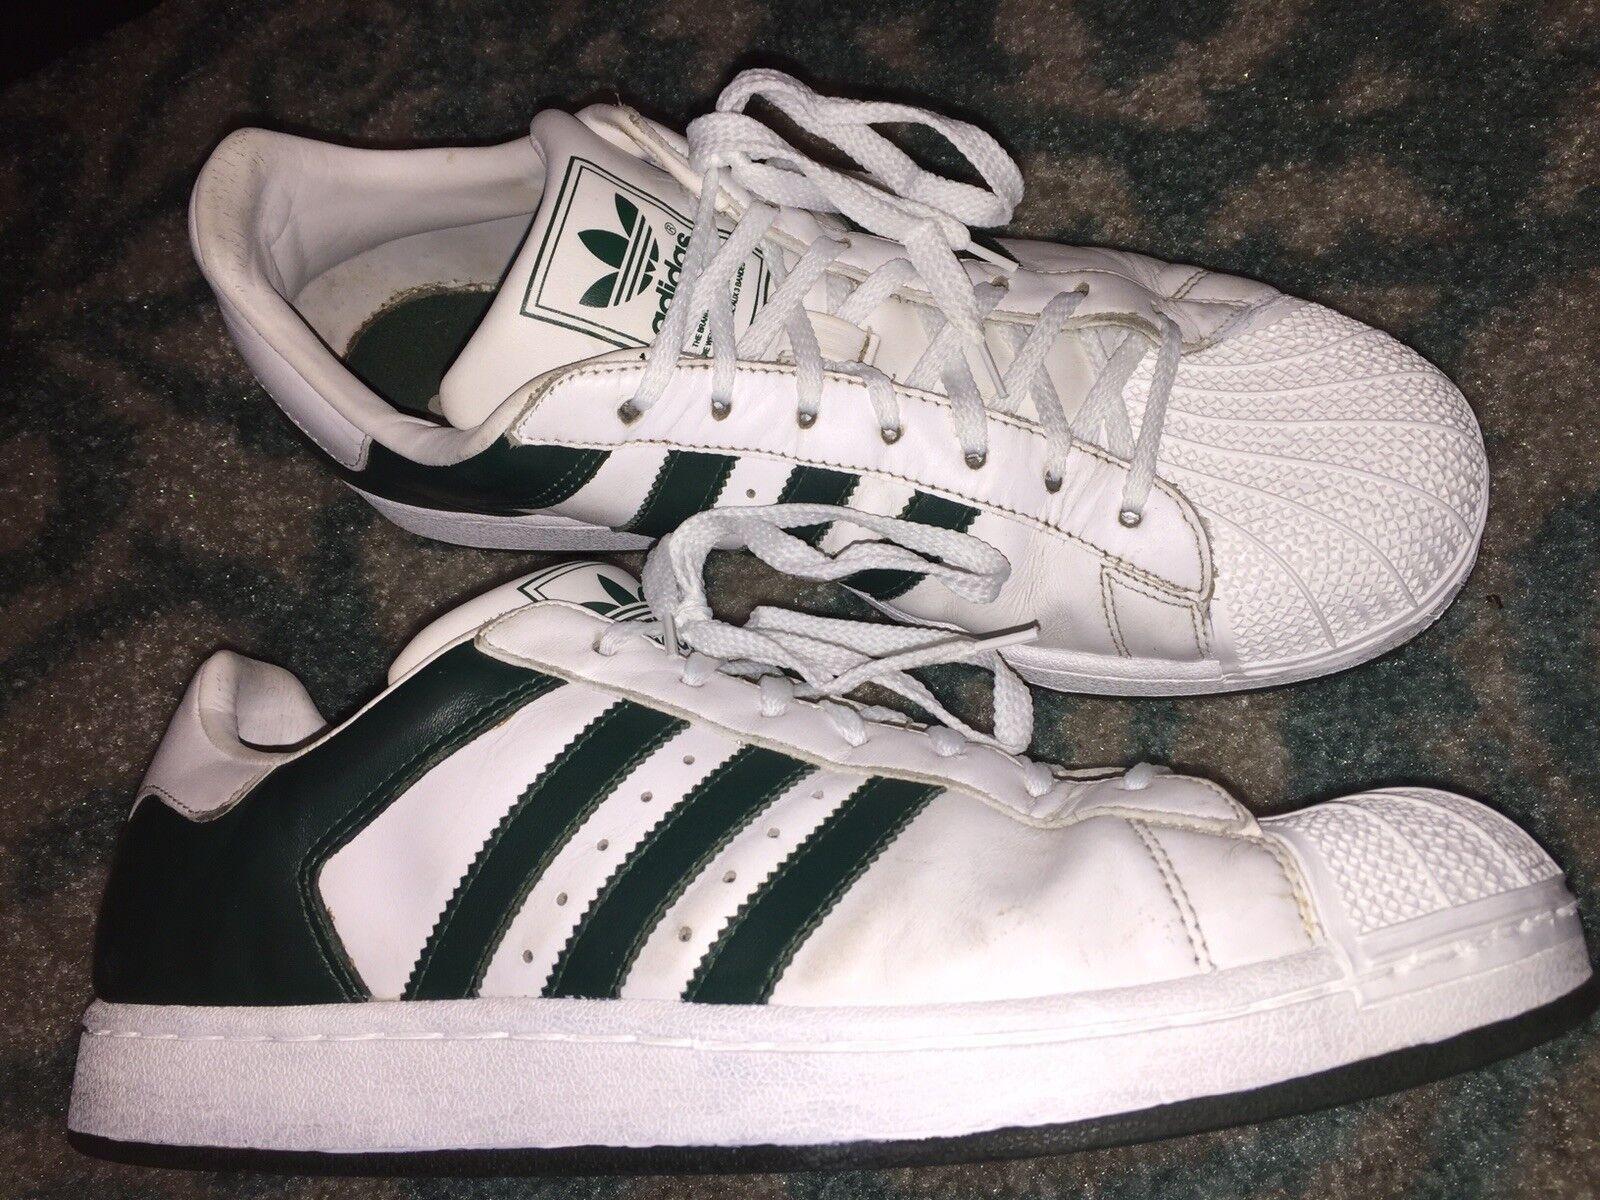 0a606639 Adidas Superstar Shell Toe para hombre nosotros tamaño 10.5 blancoo verde  Tenis Zapatos ntvdco857-Zapatillas deportivas